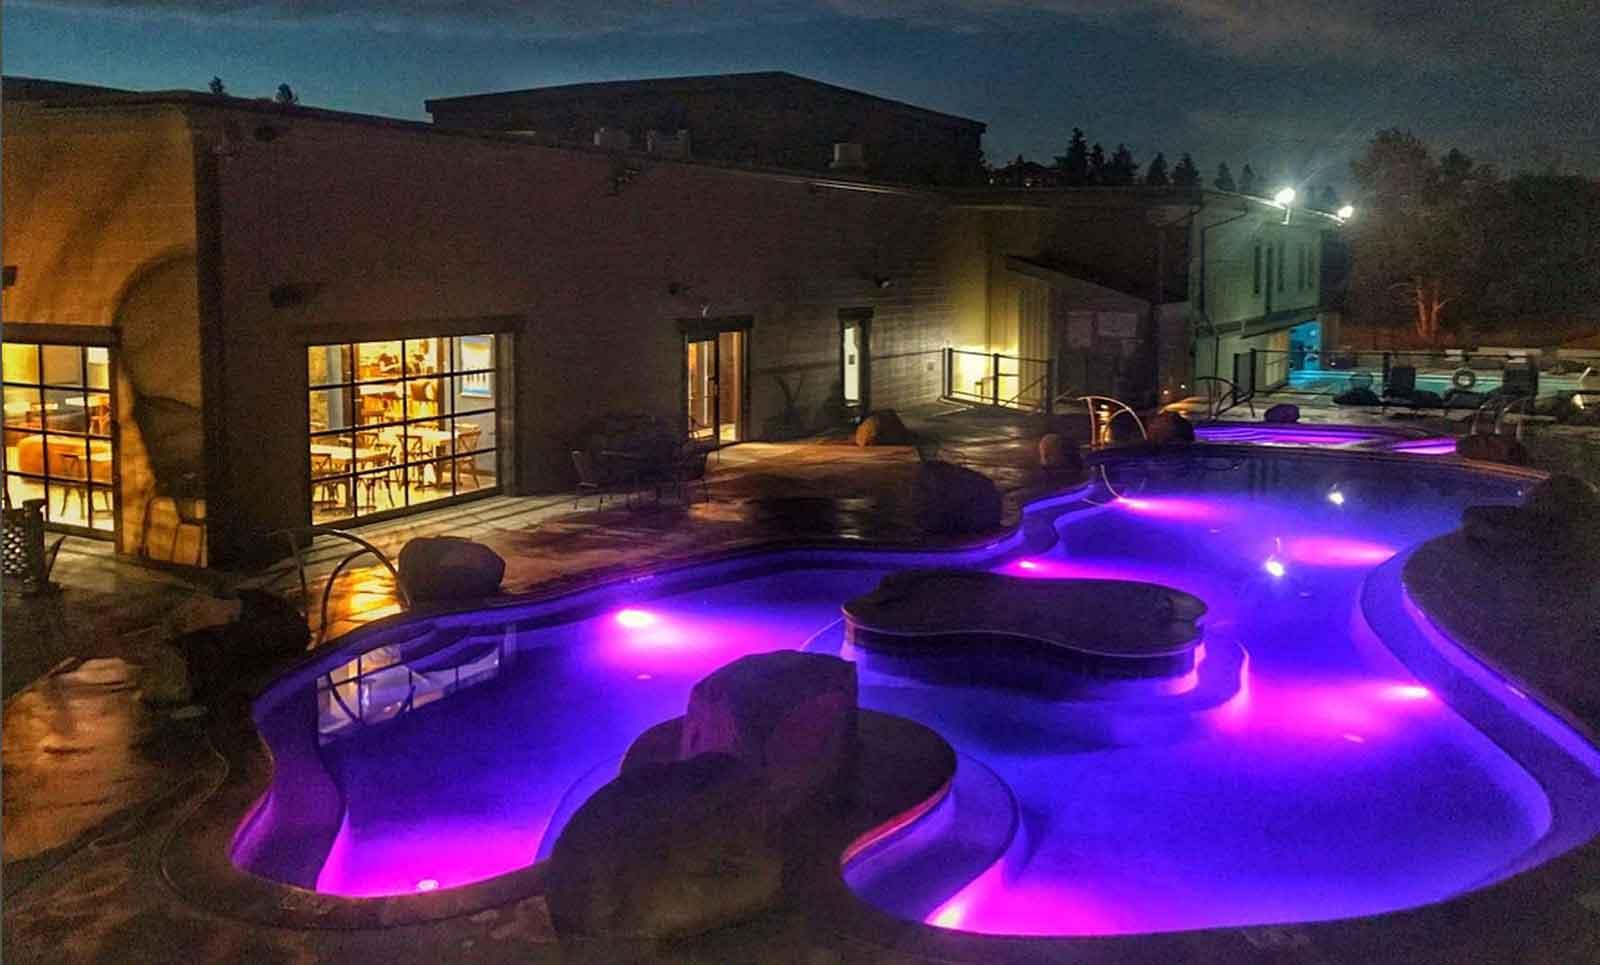 Broadwater Hot Springs Pools